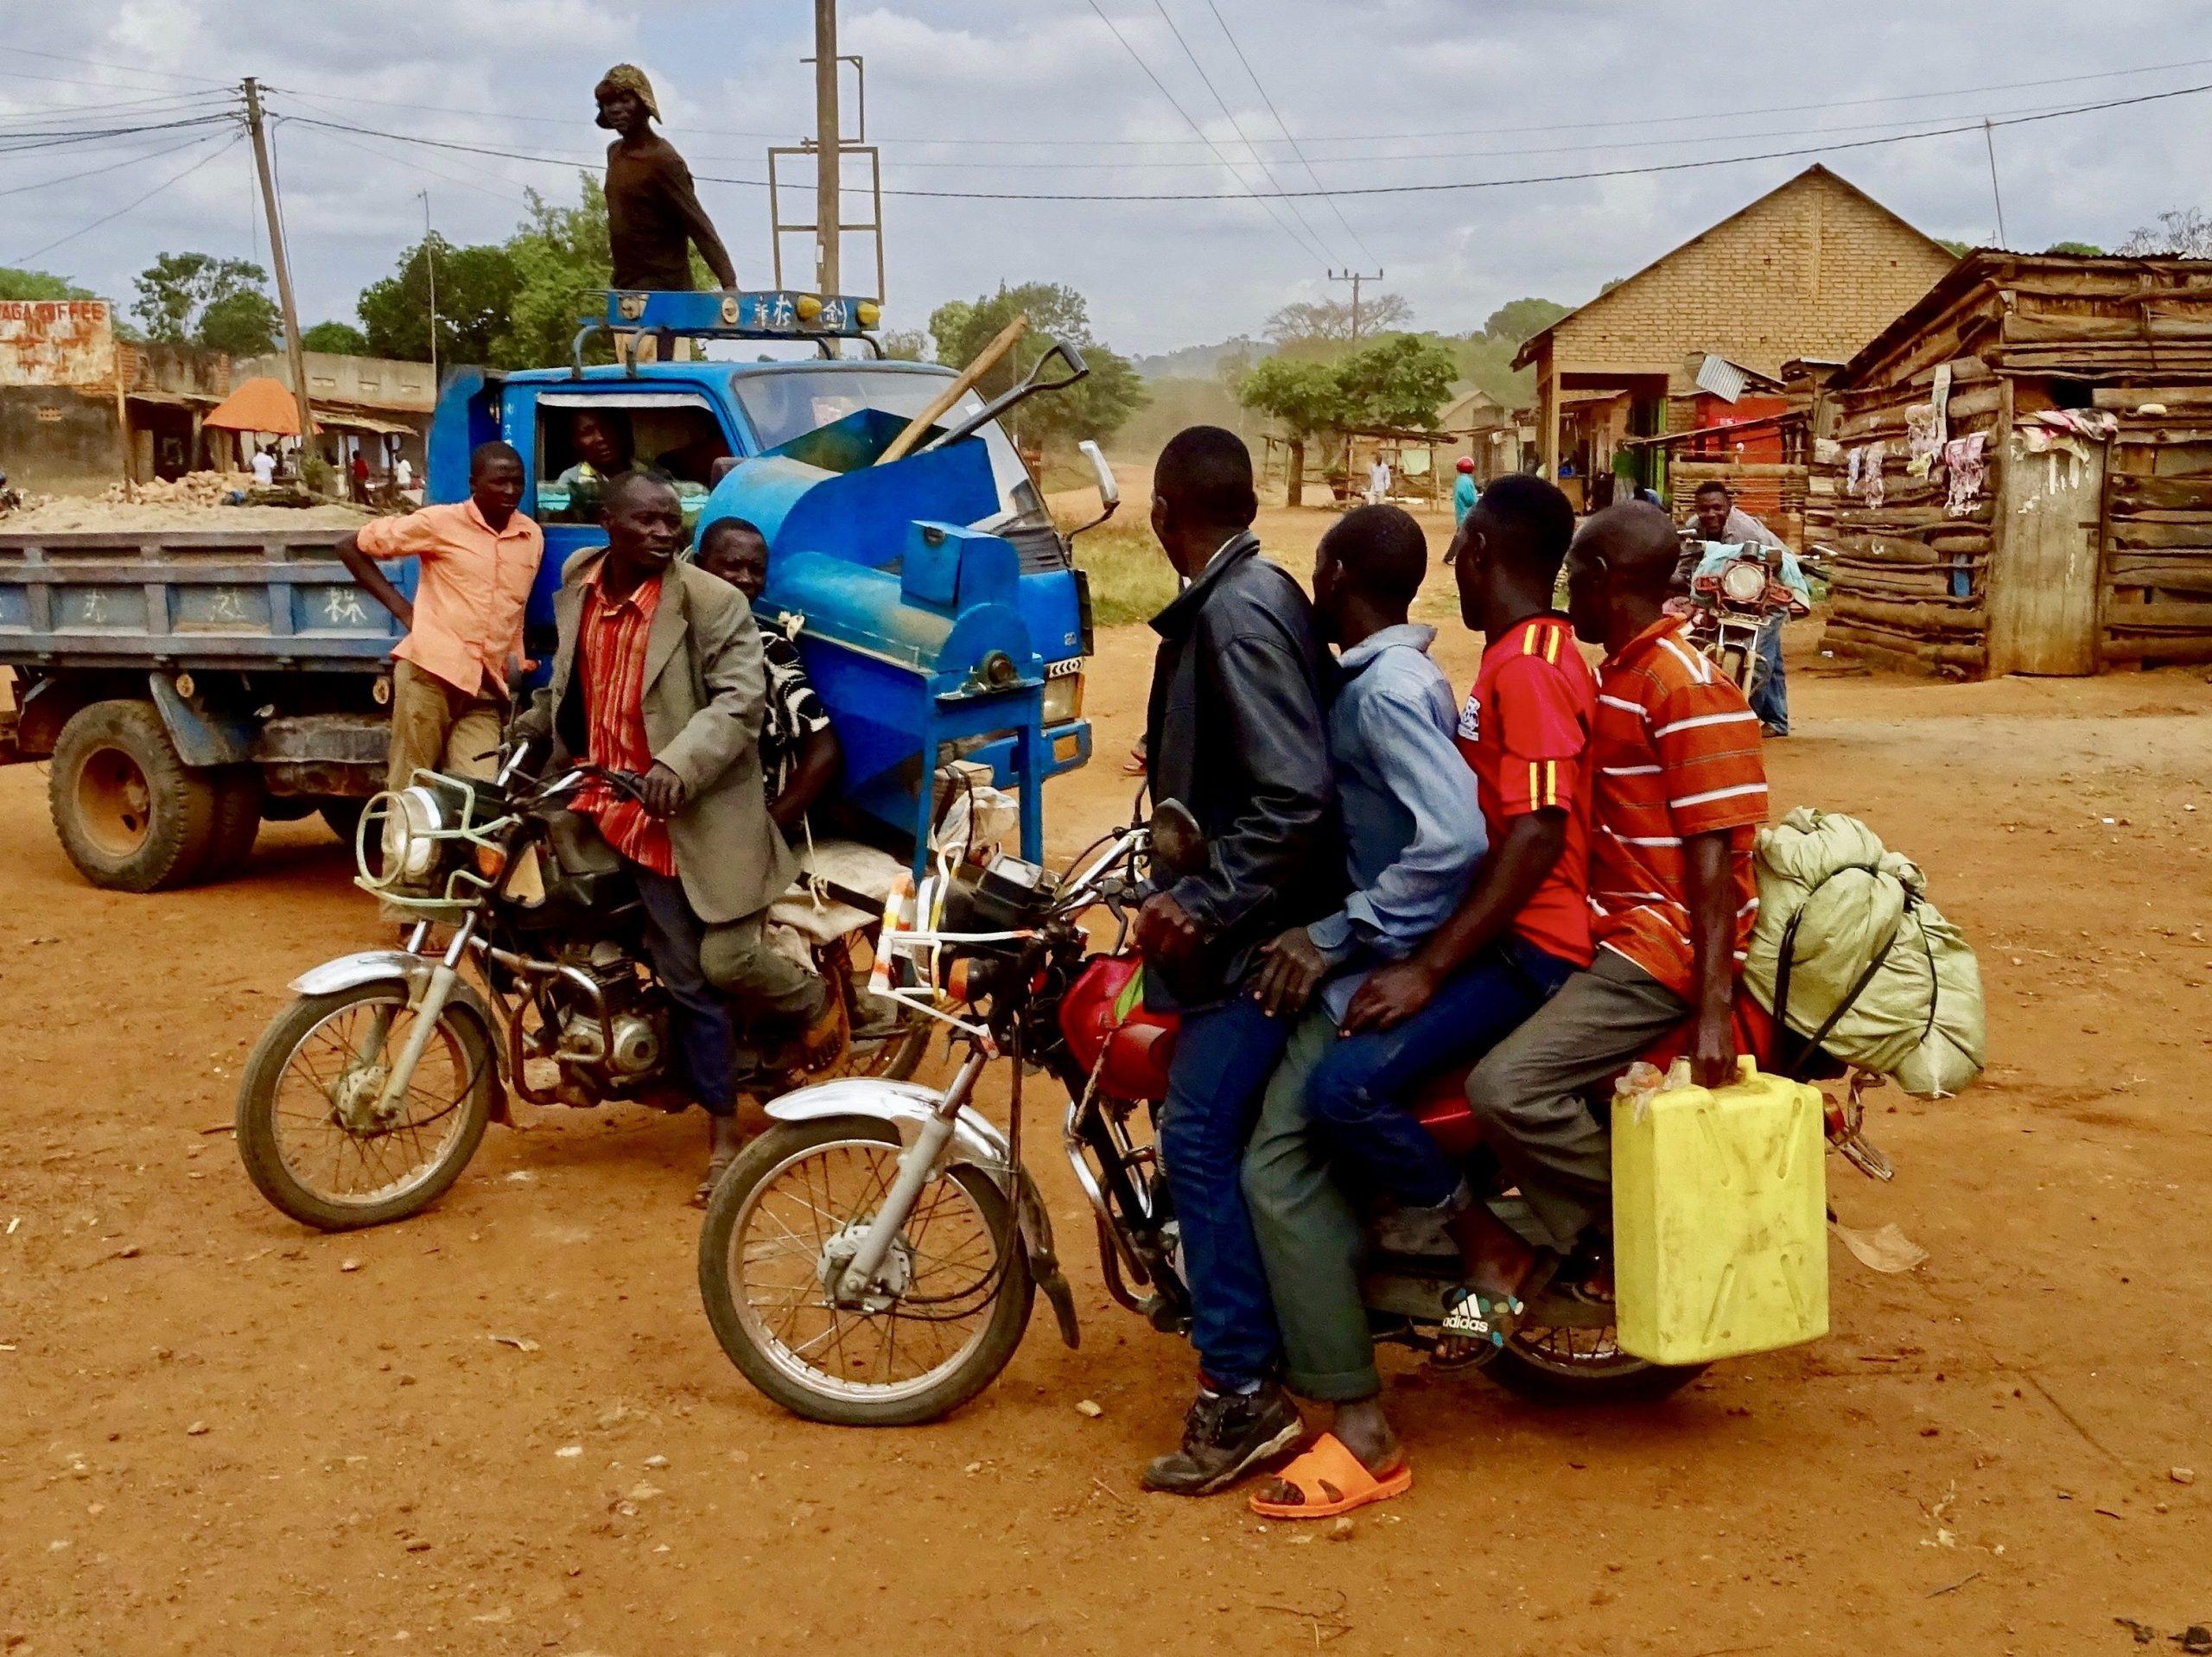 Boda boda's met van alles en nog wat langs weg in Oeganda